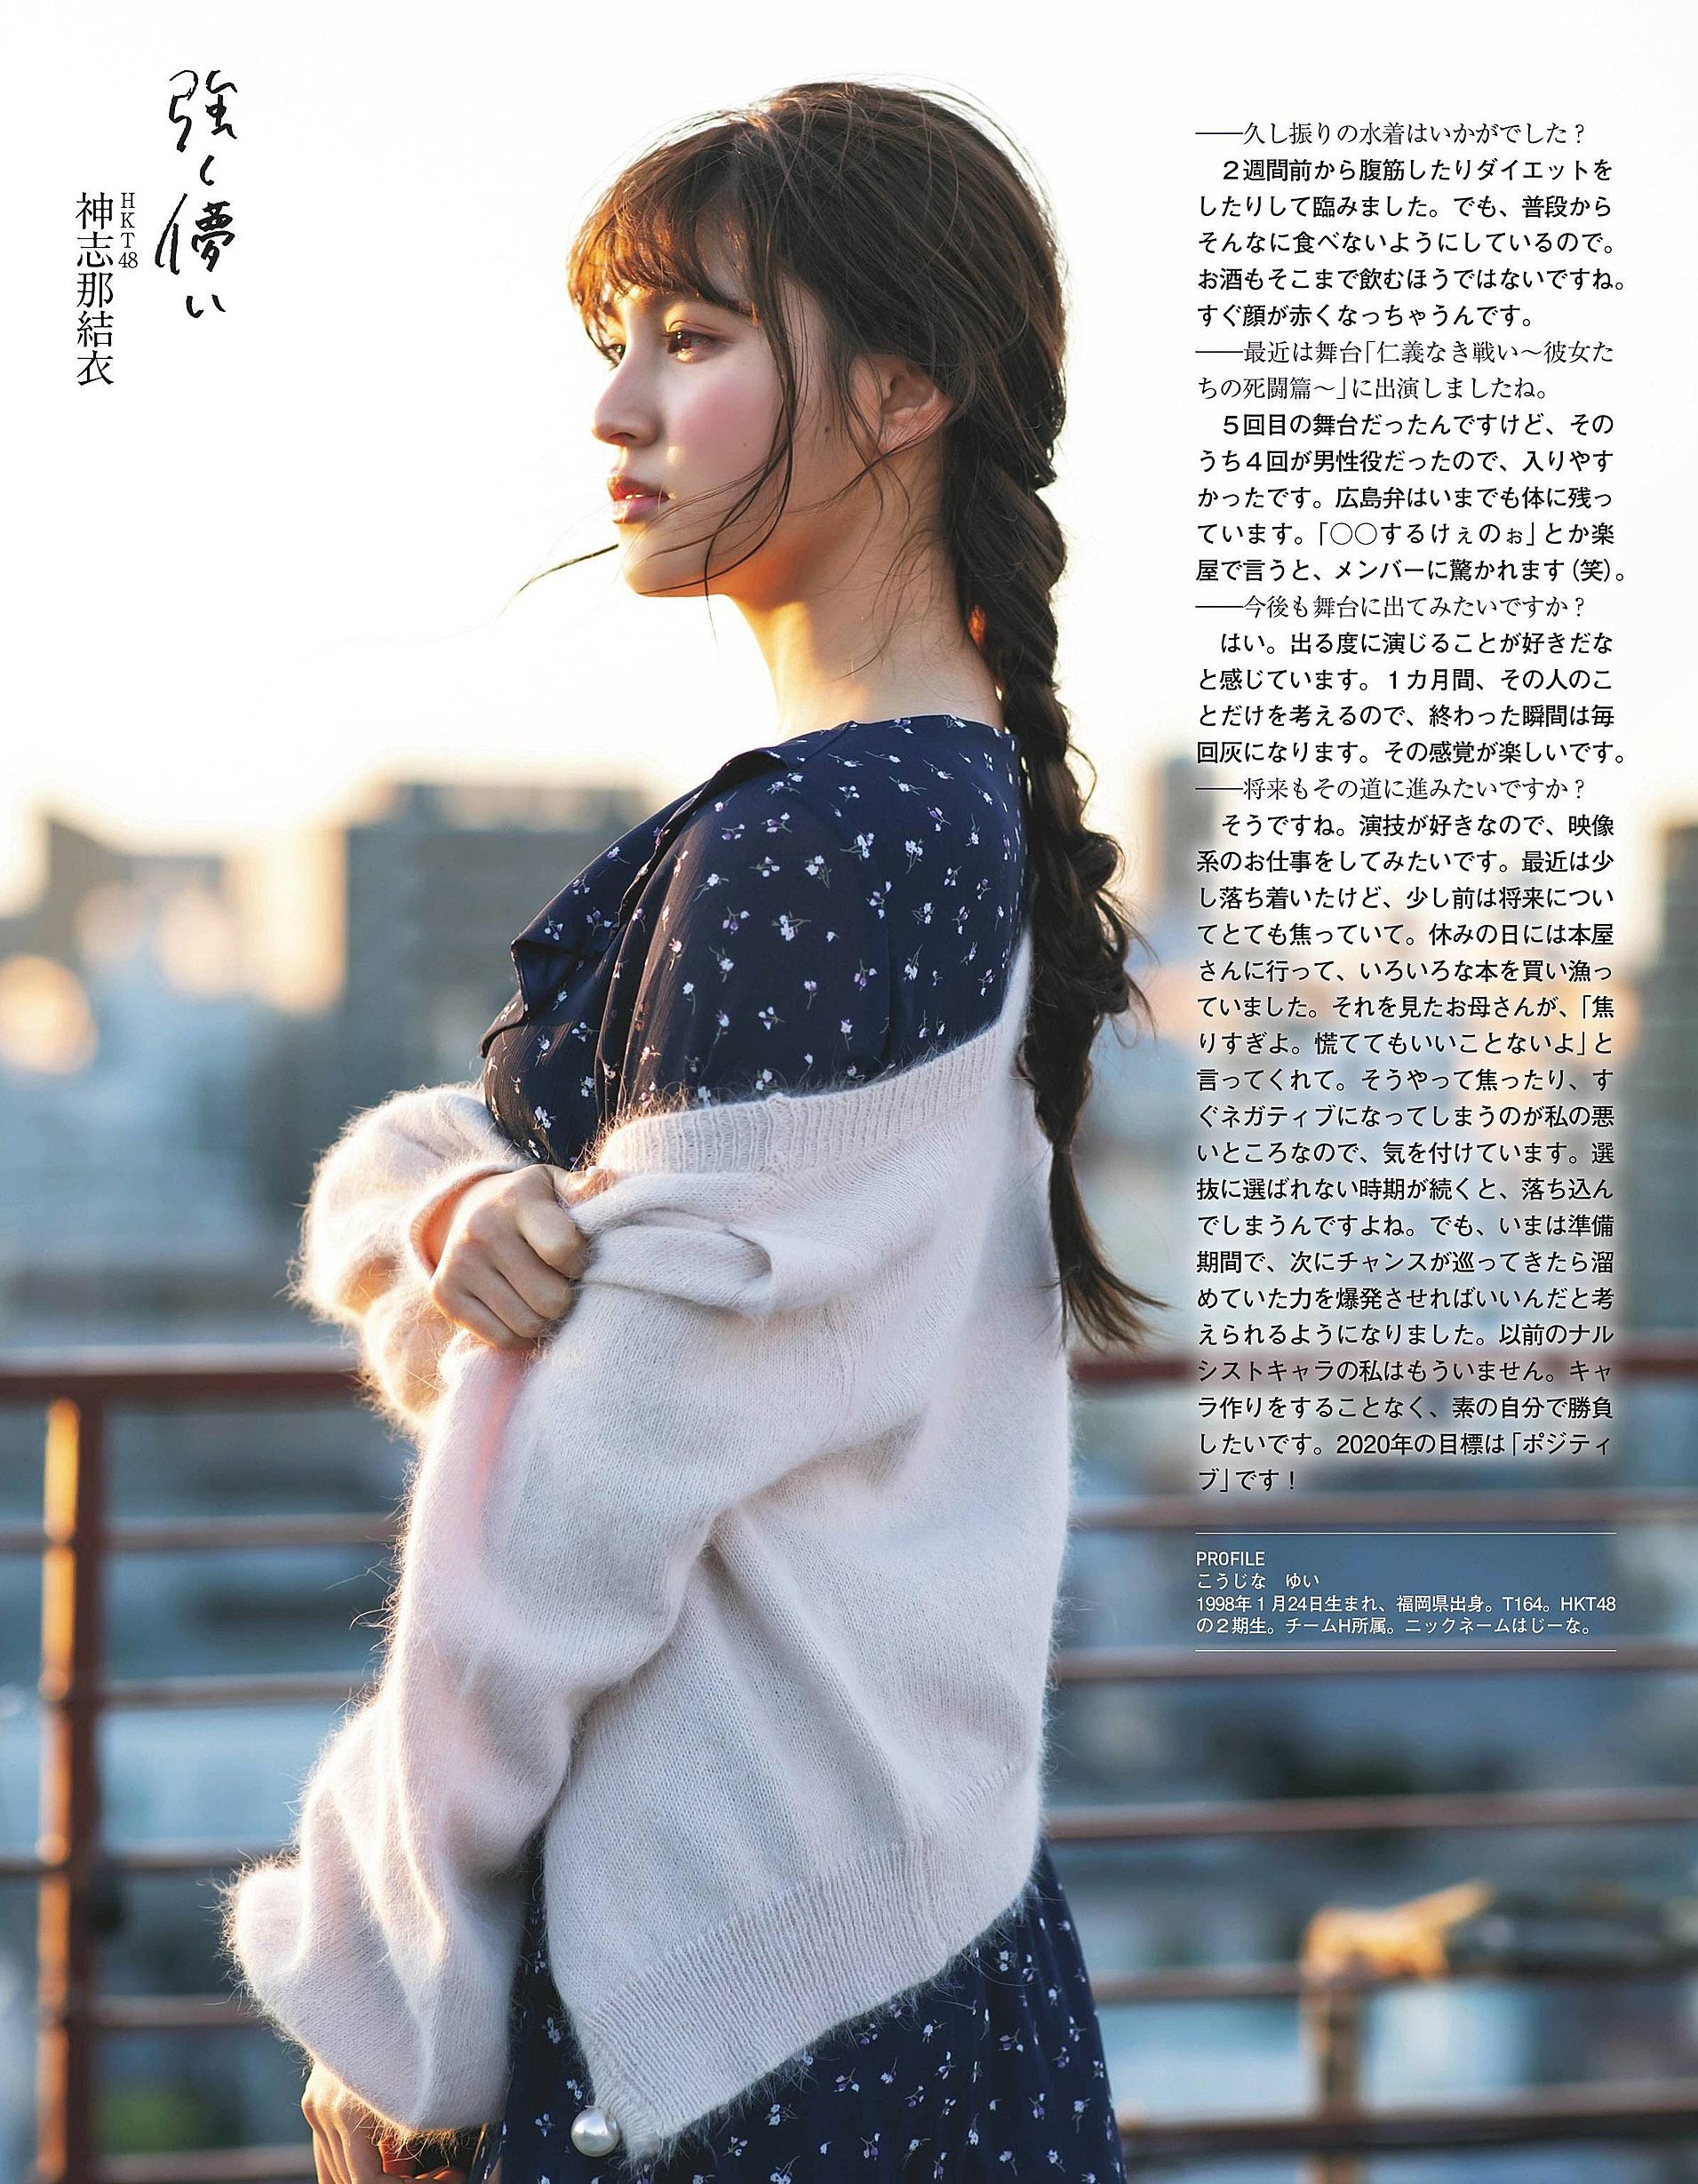 YKojina EX-Taishu 2002 10.jpg